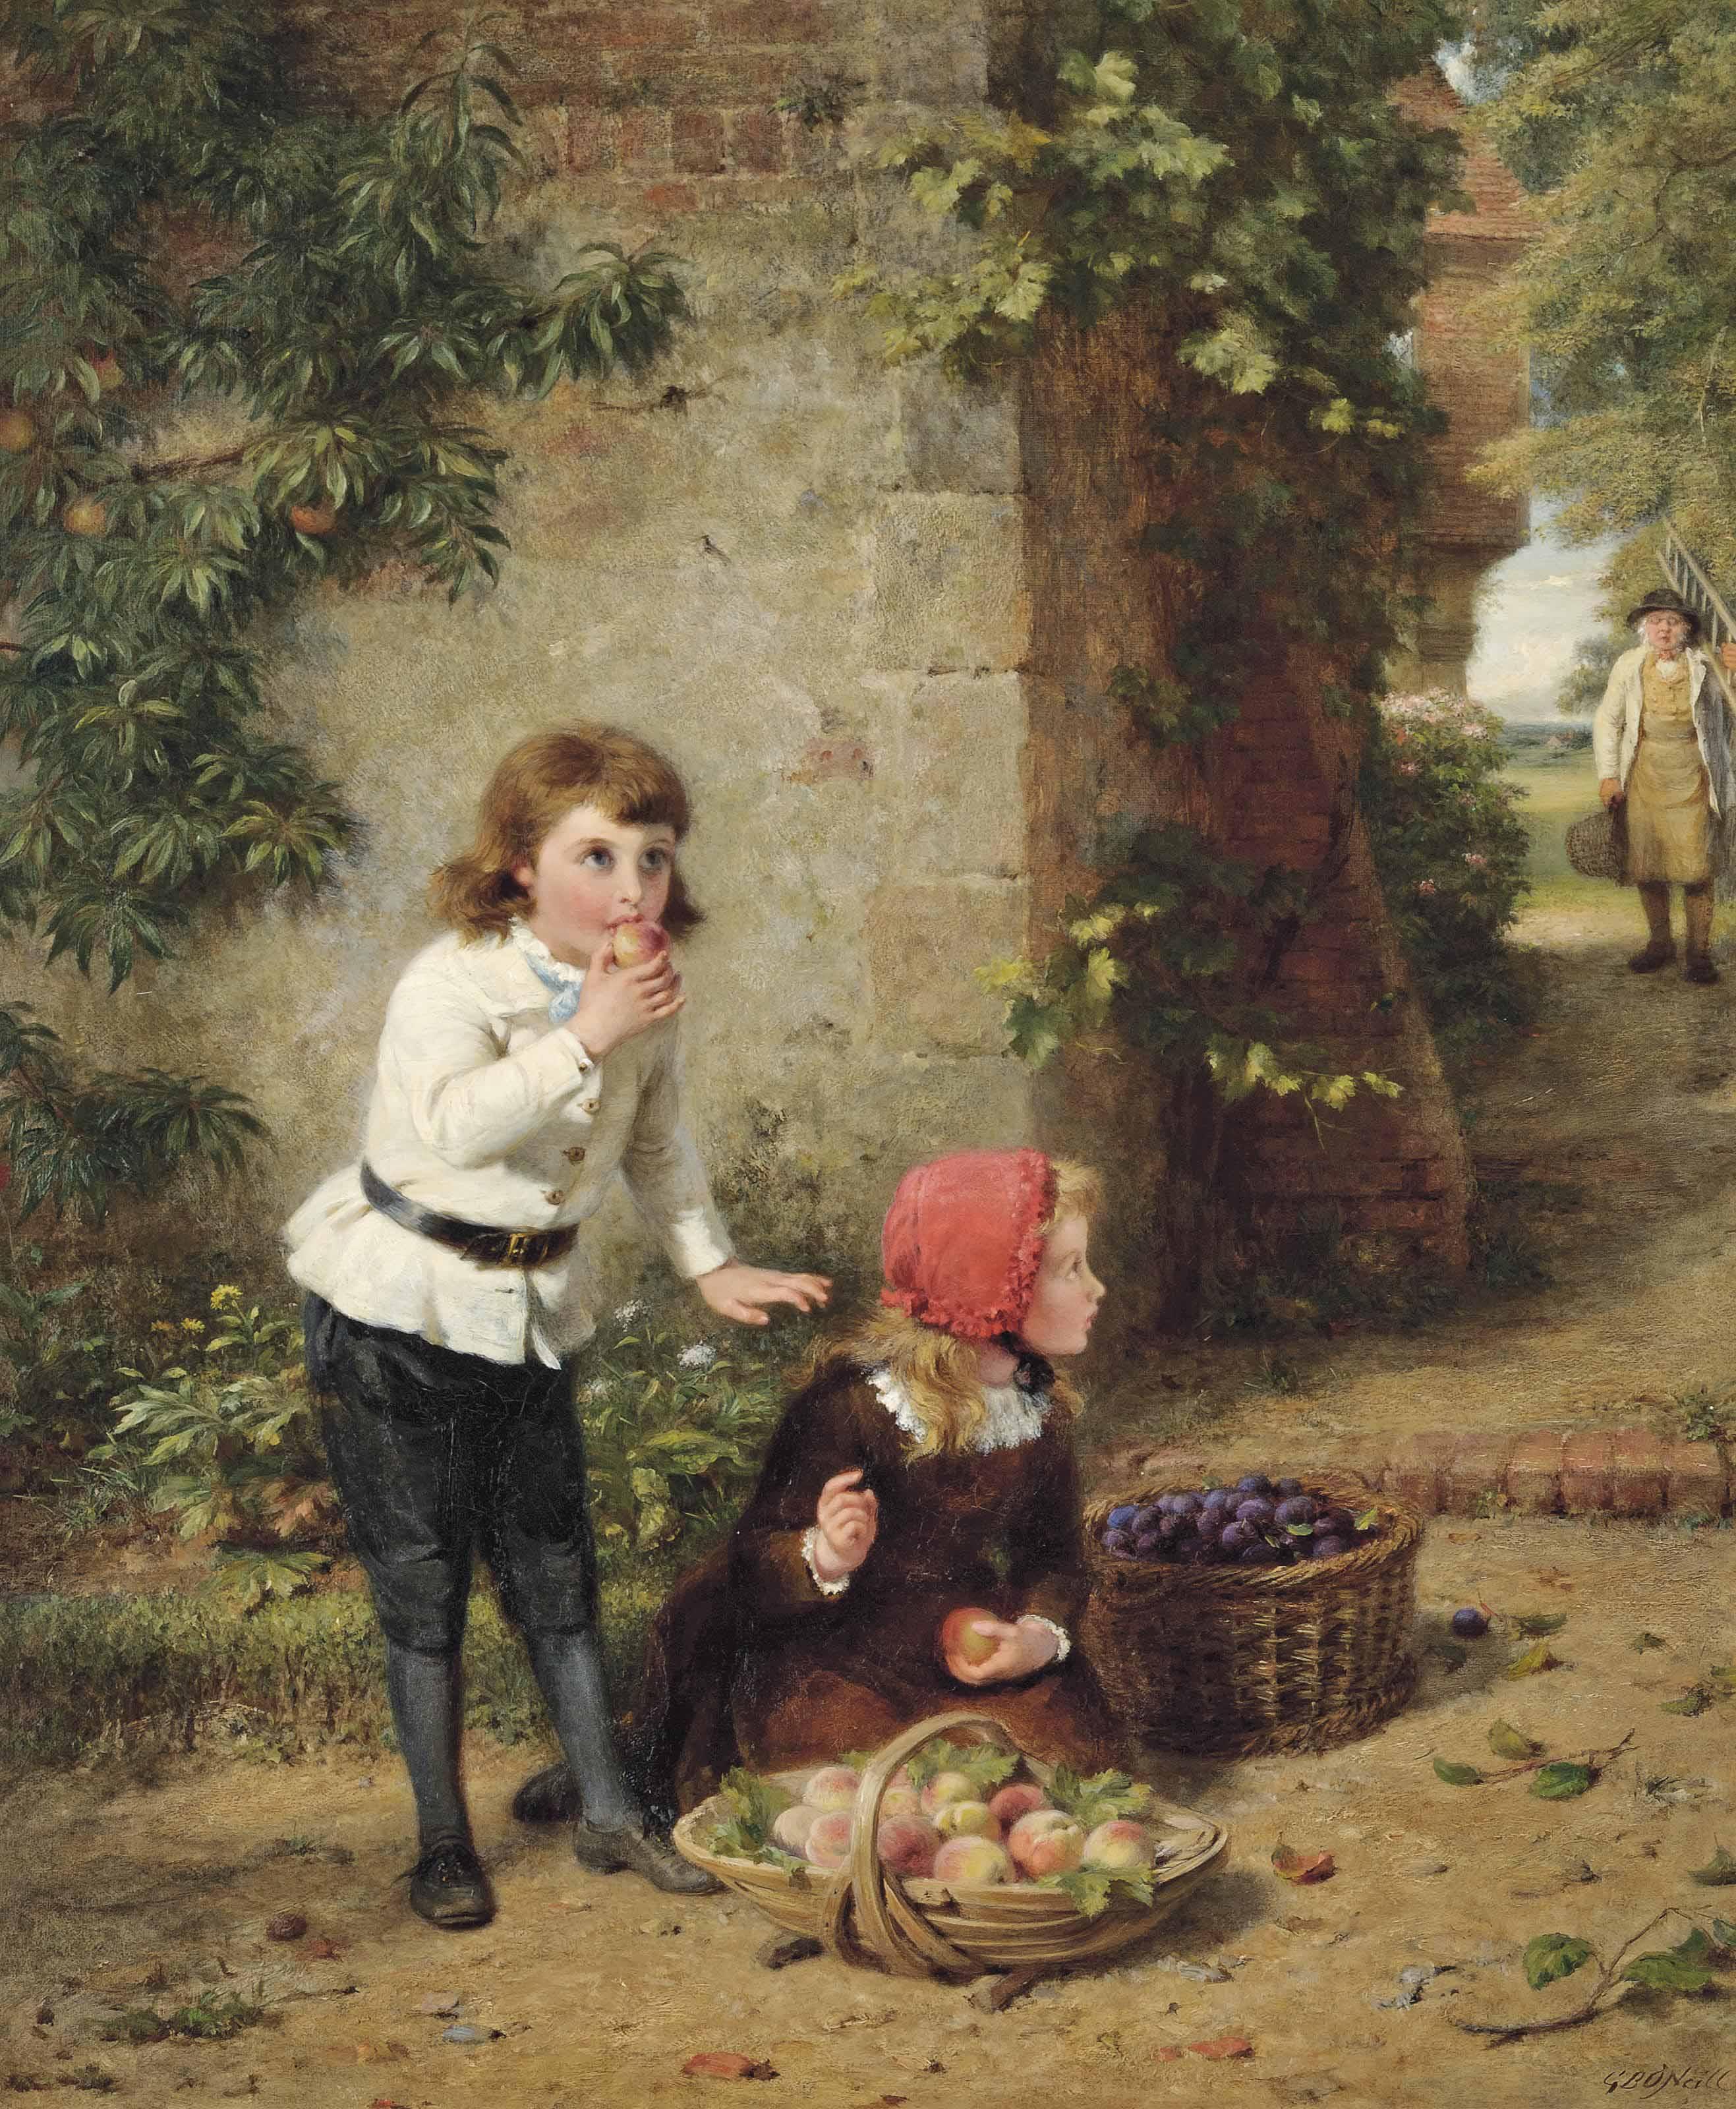 Stolen fruit is the sweetest